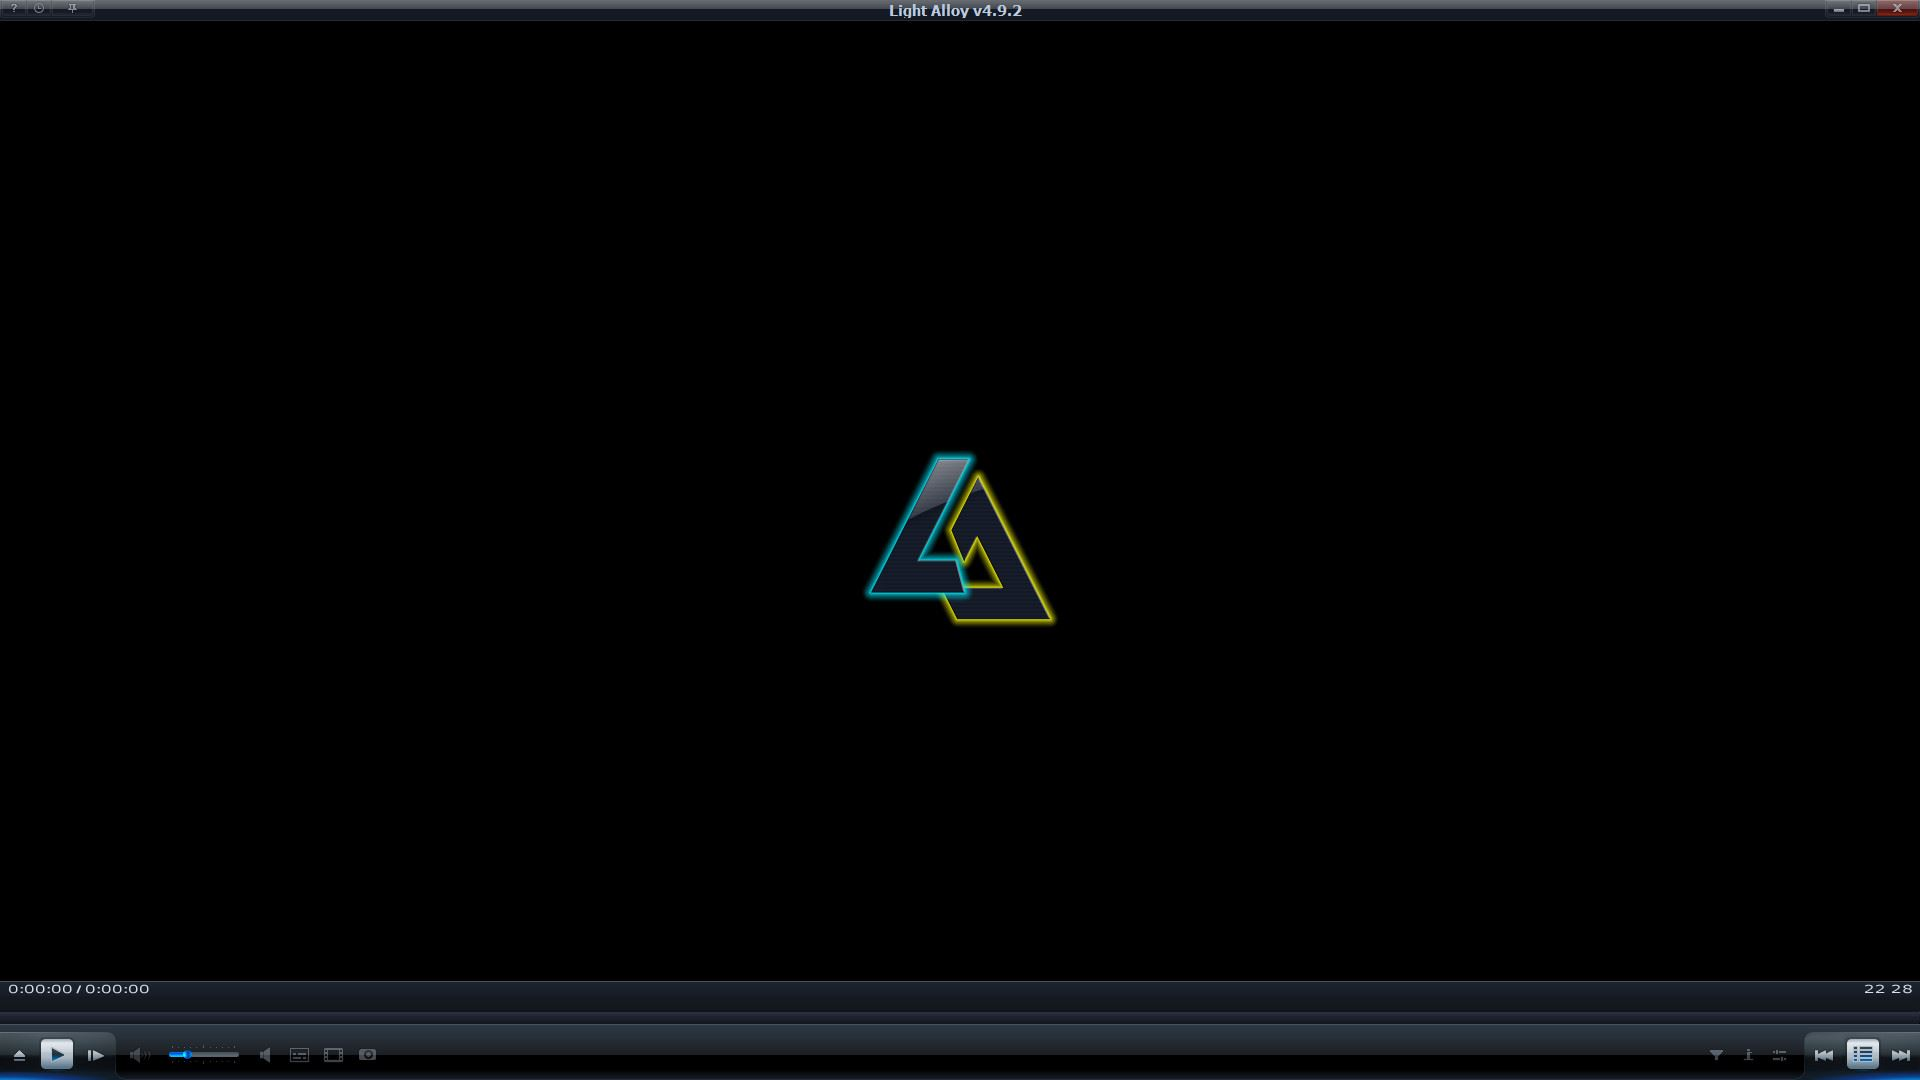 Light Alloy 4.9.2 Build 2516 Final + Portable (2017) Multi/Русский